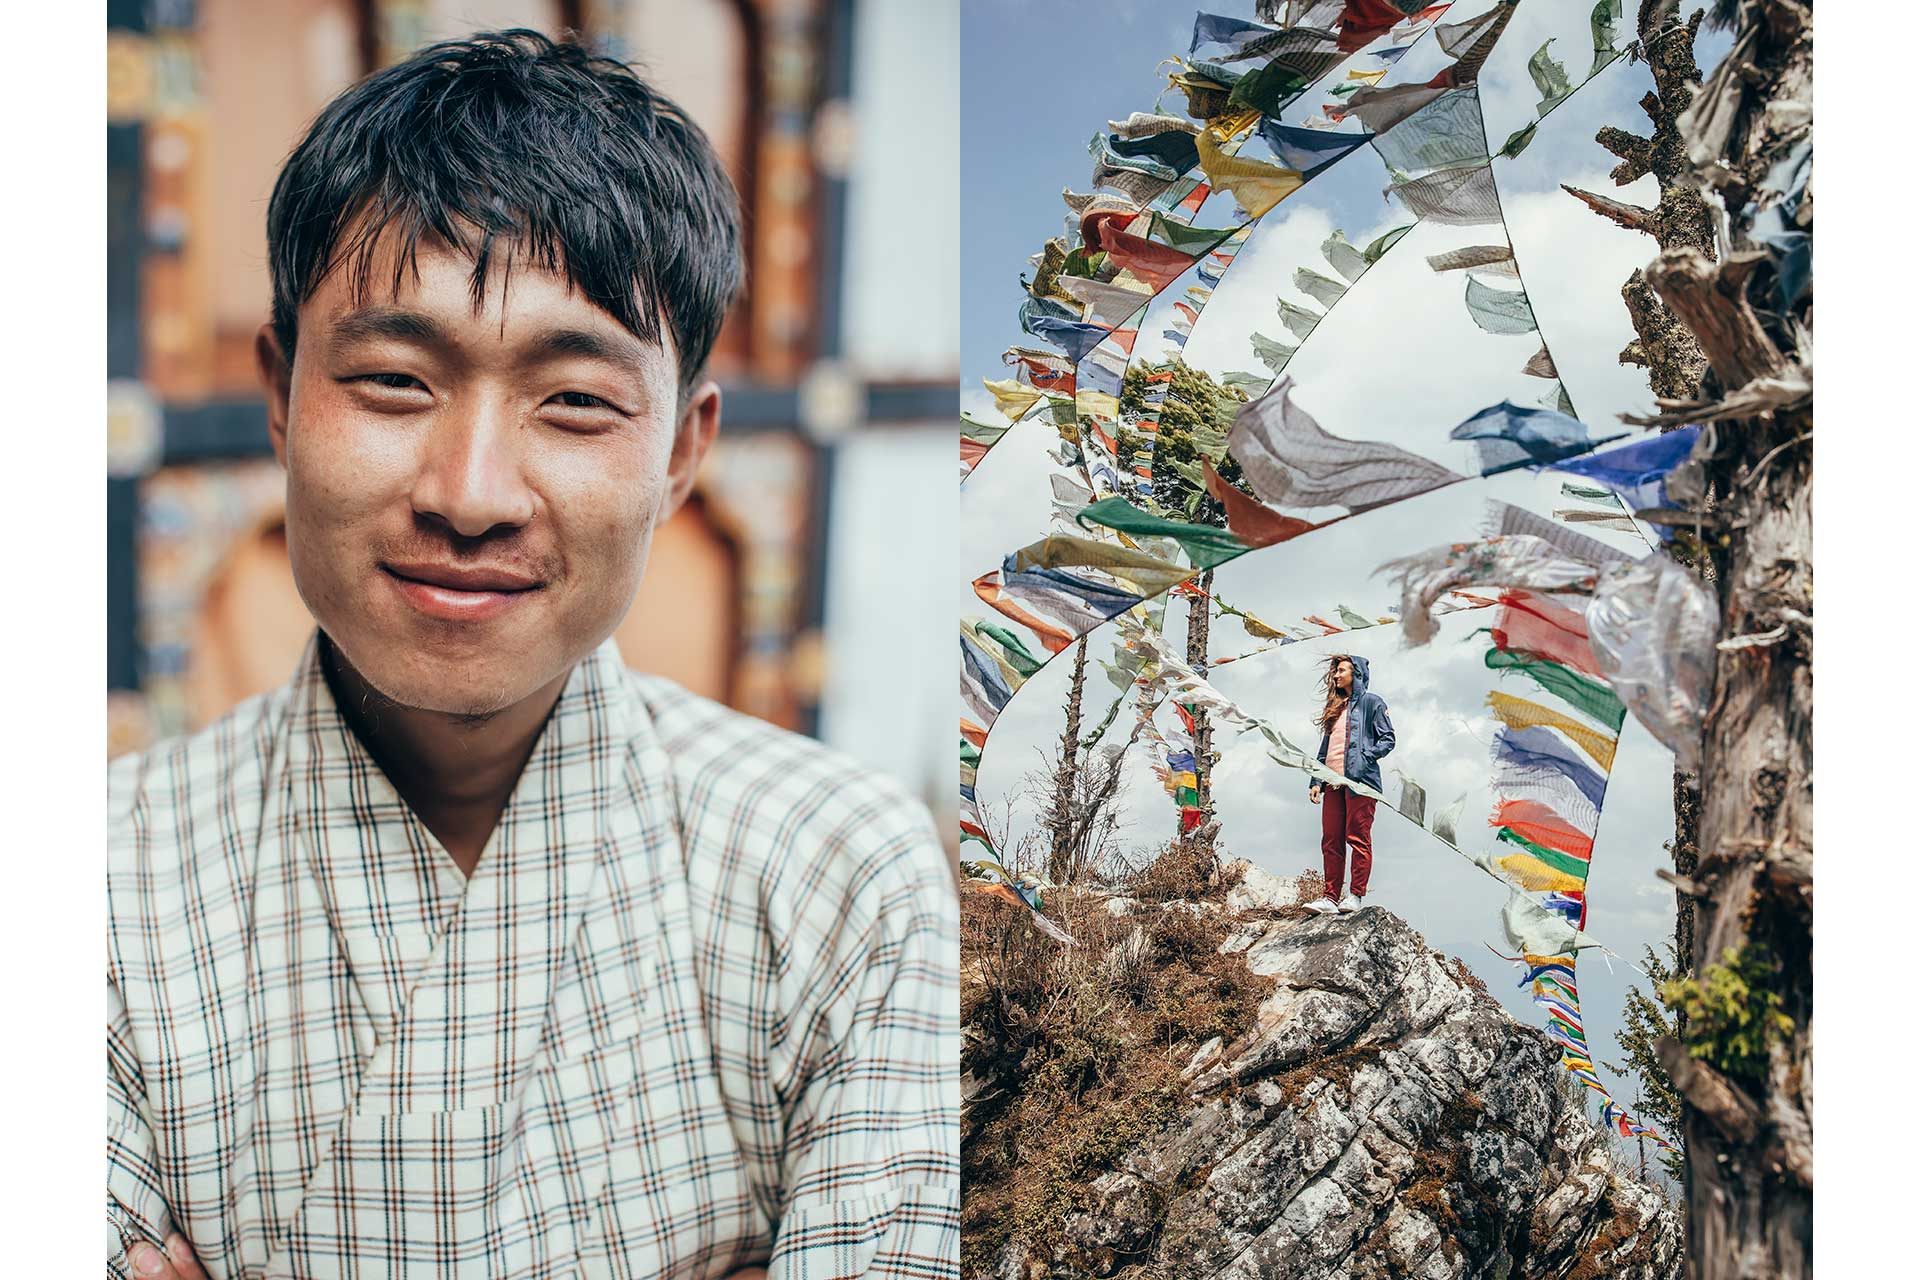 Reise Fotograf Gebetsfahnen Bhutan Himalaya Maloja Katalogproduktion London